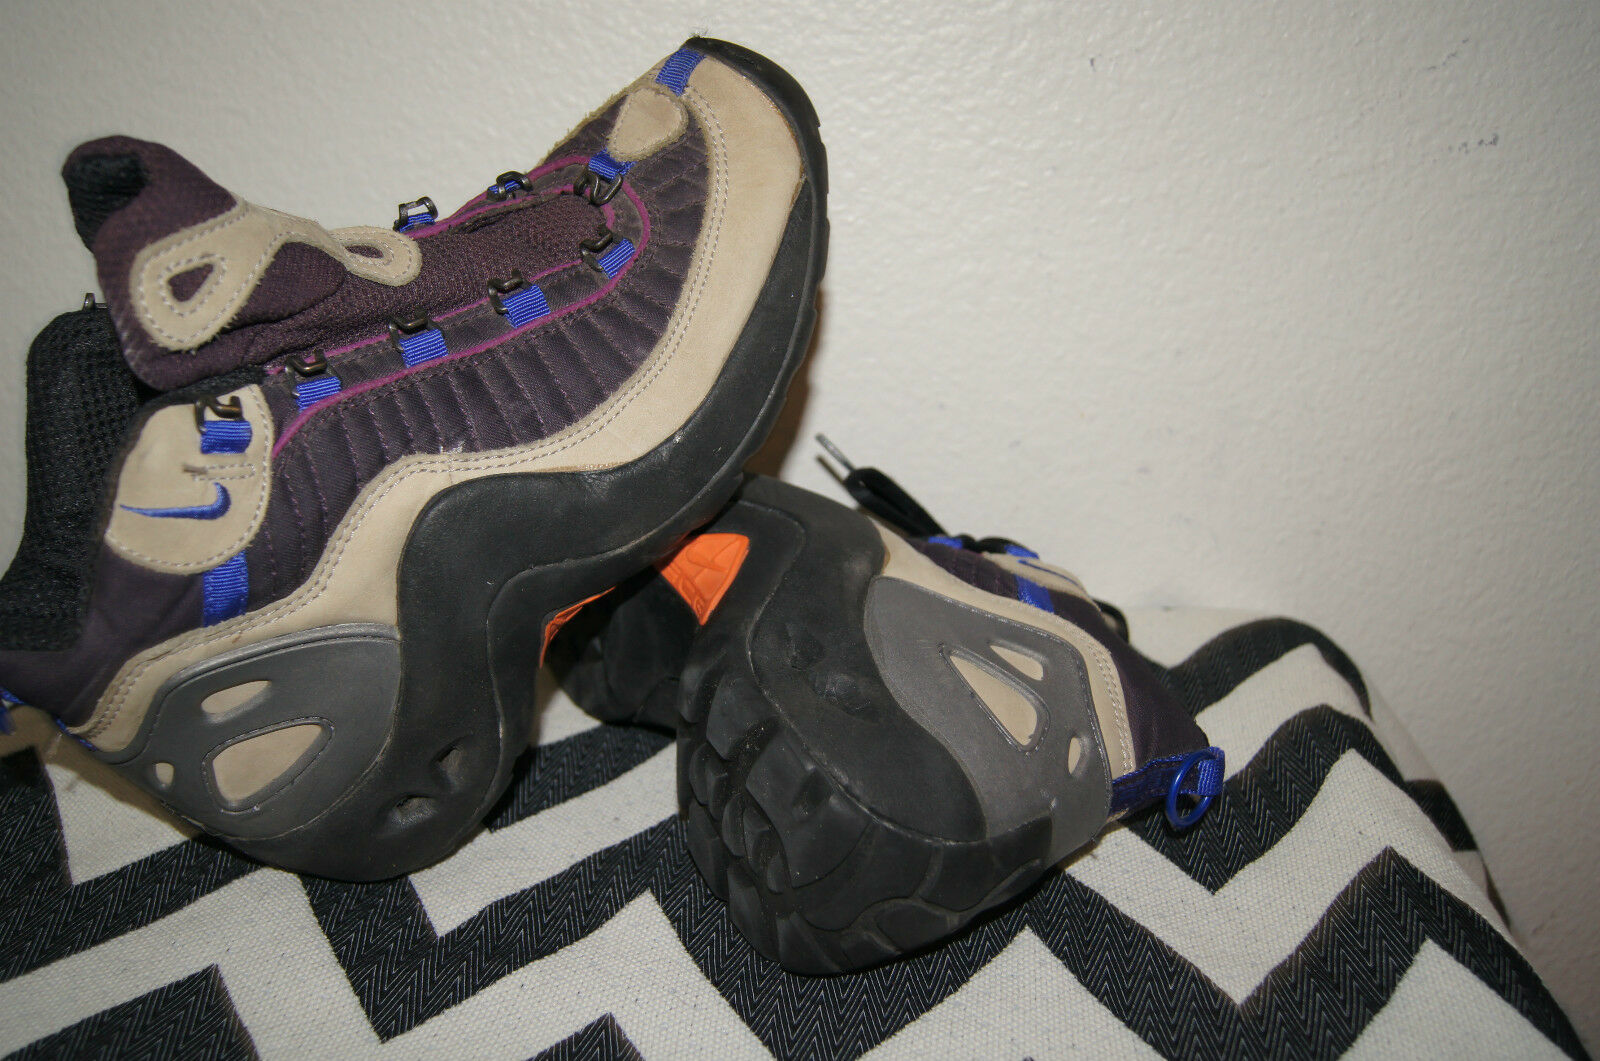 ACG Women Nike Boots Size 9 40.5 NIKE BOOTS 9 MENS 7.5 NIKE ACG 9 NIKEY BOOTS 9